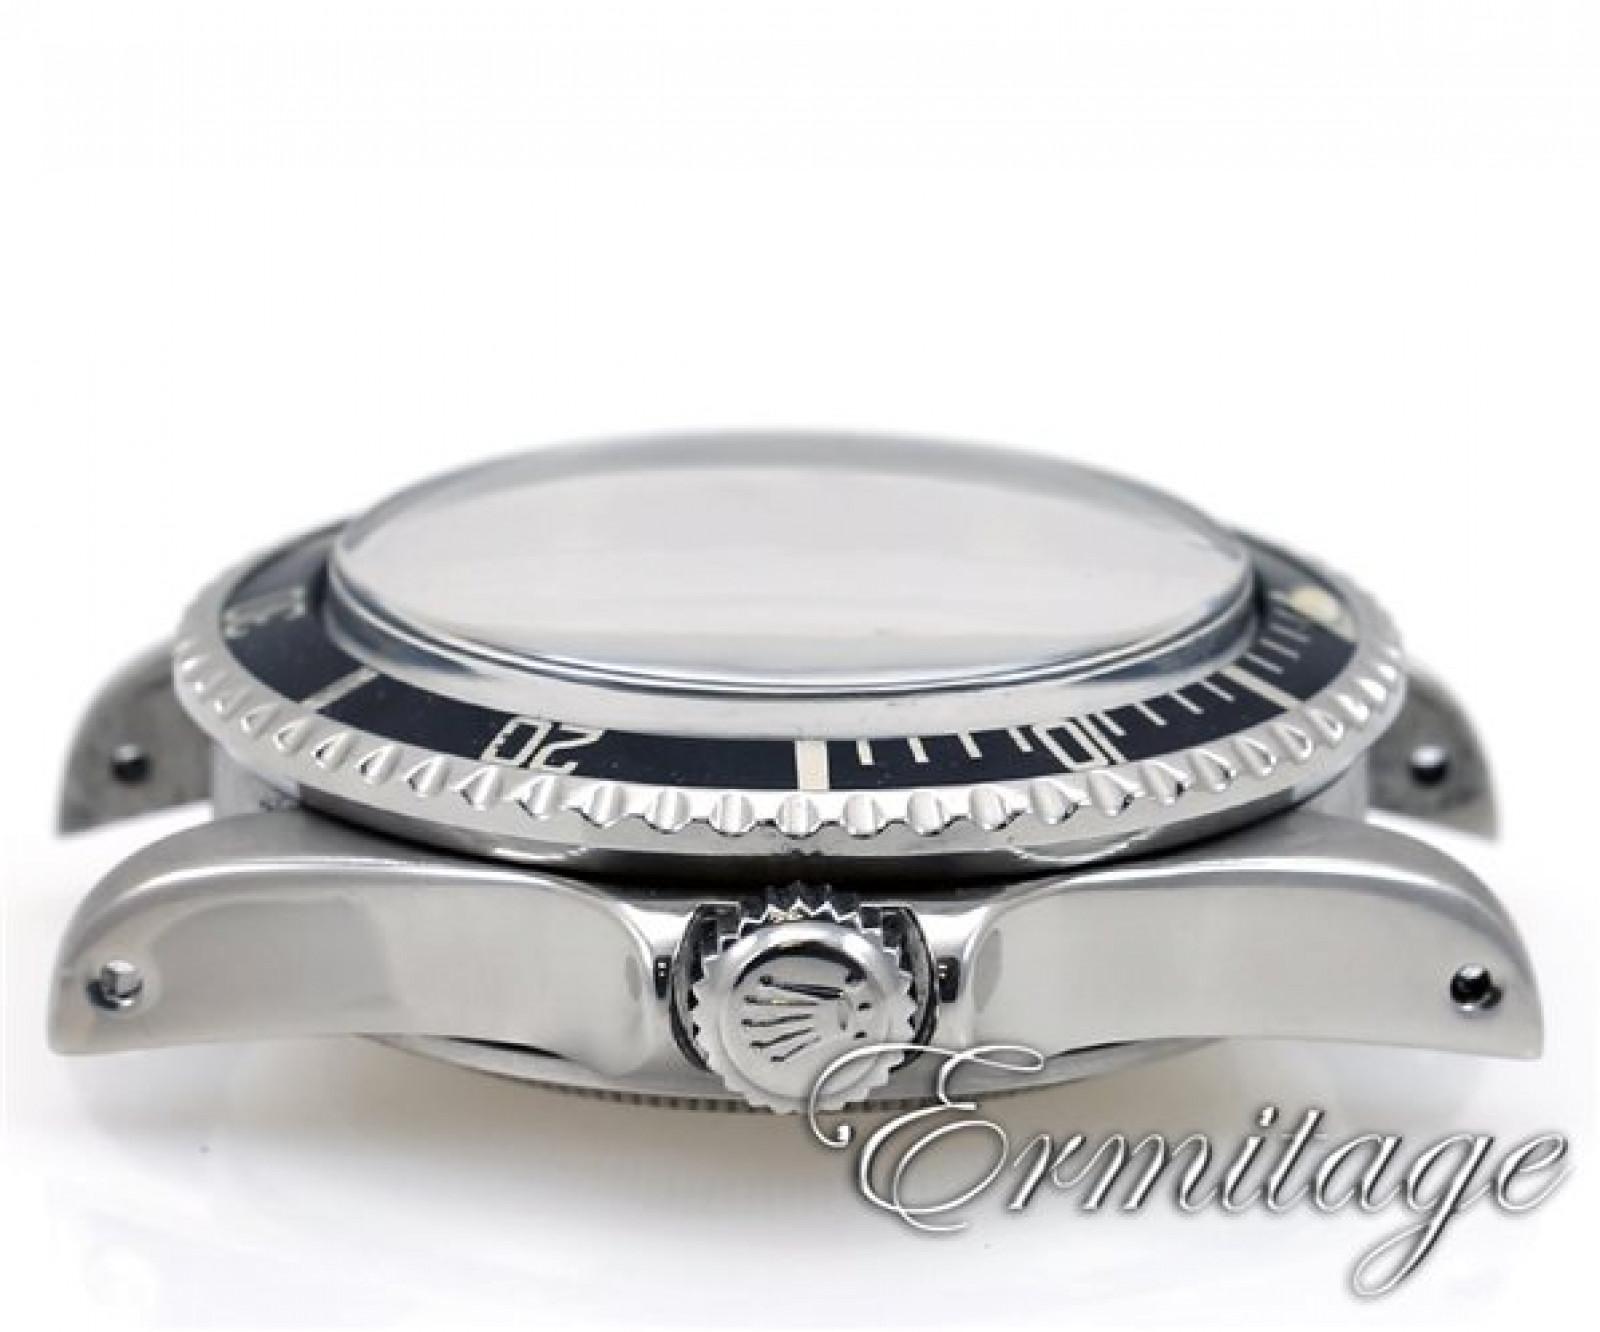 Rare Vintage Rolex Sea-Dweller 1665 Steel